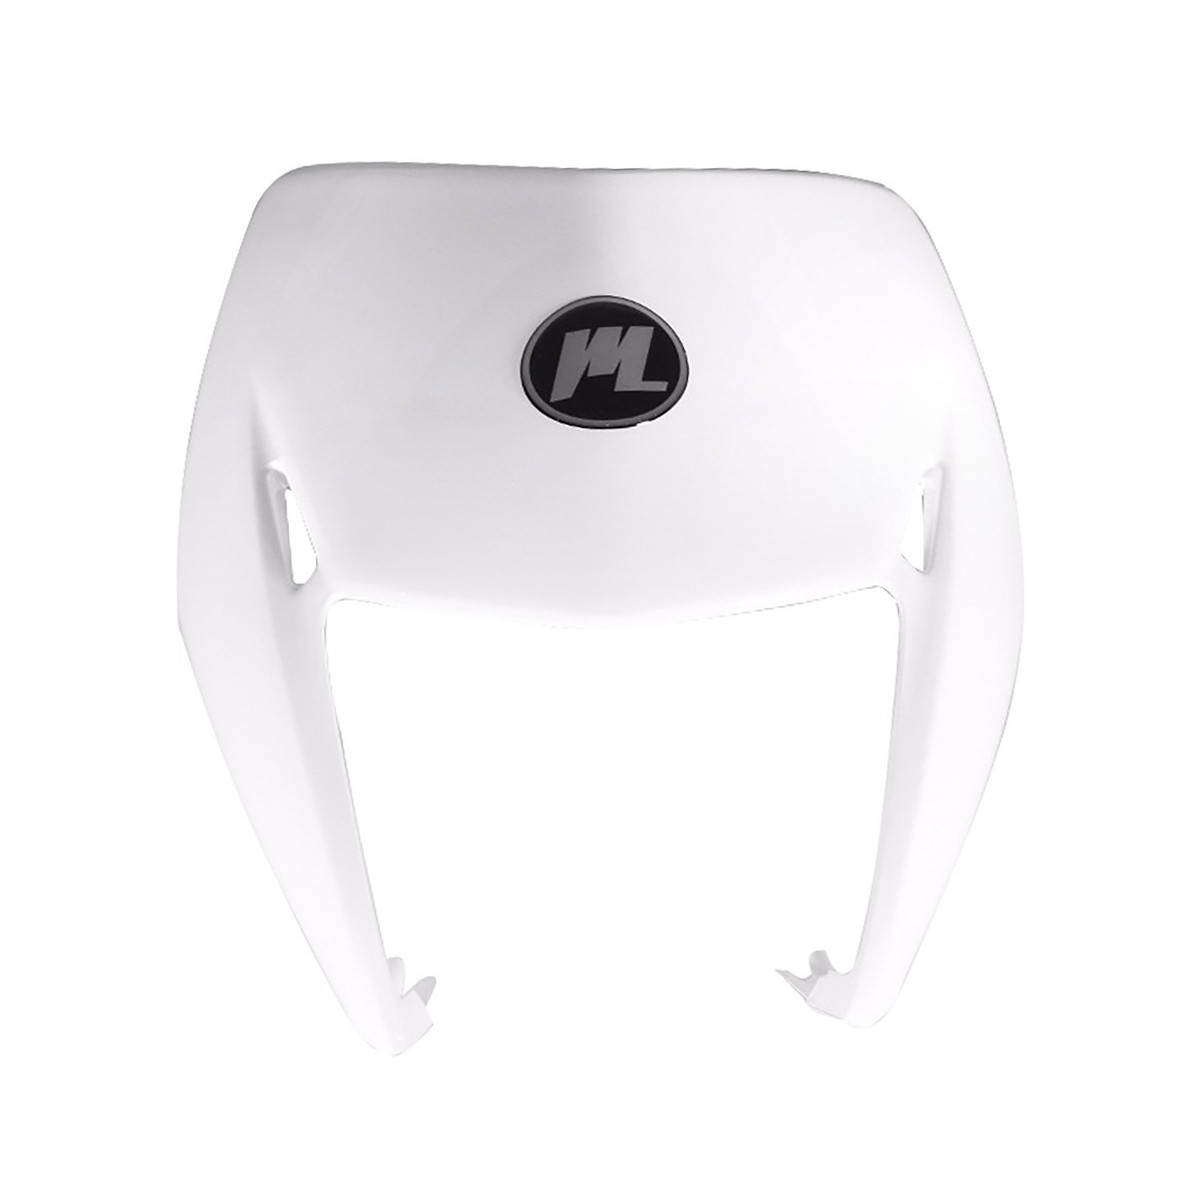 Mascara Optica Blanco Motomel Skua 150 Modelo Nuevo Original